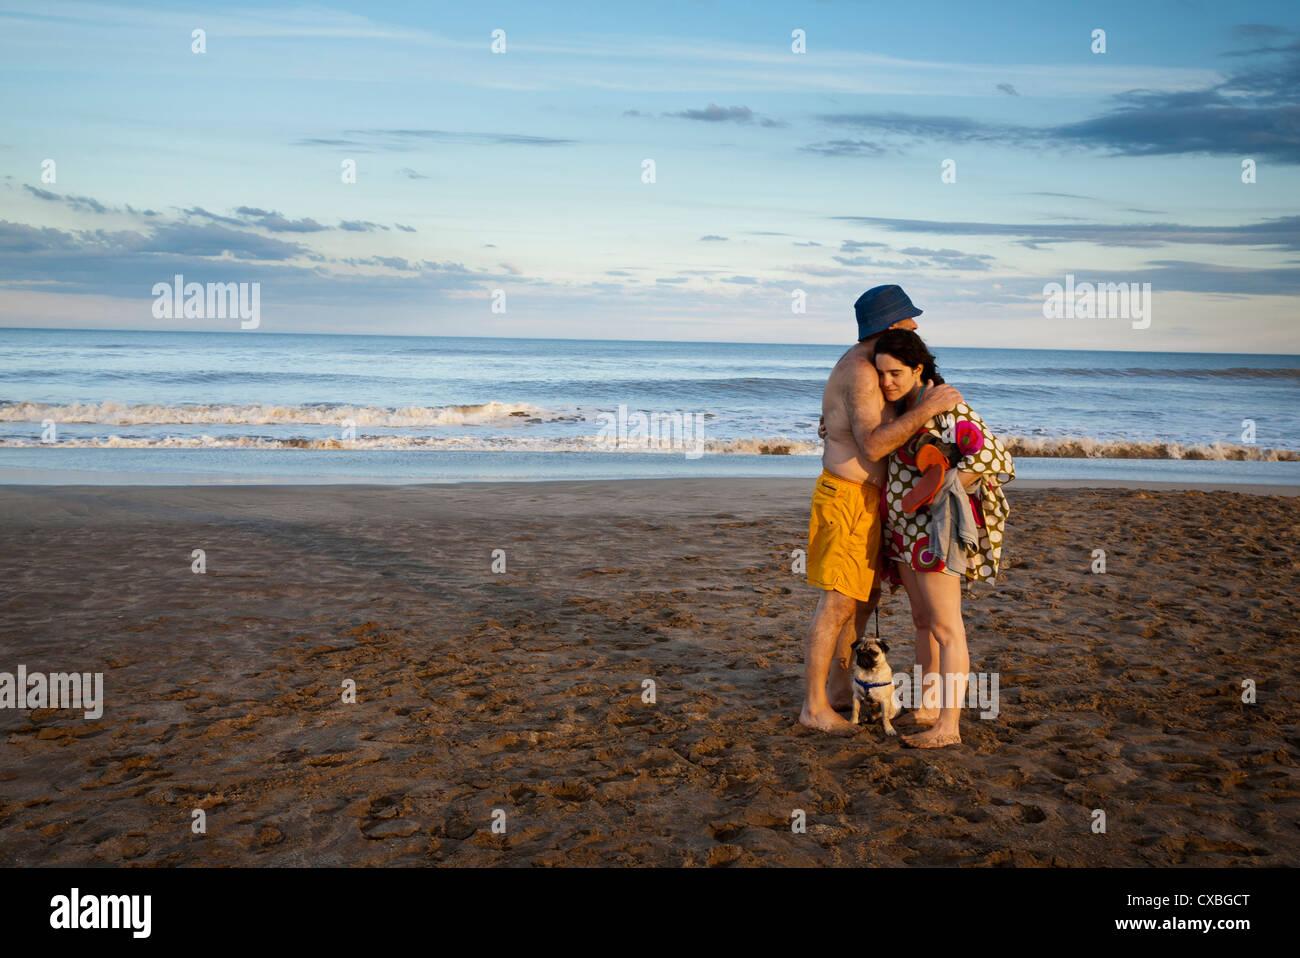 Paar am Strand, Mar de Las Pampas, Argentinien. Stockbild